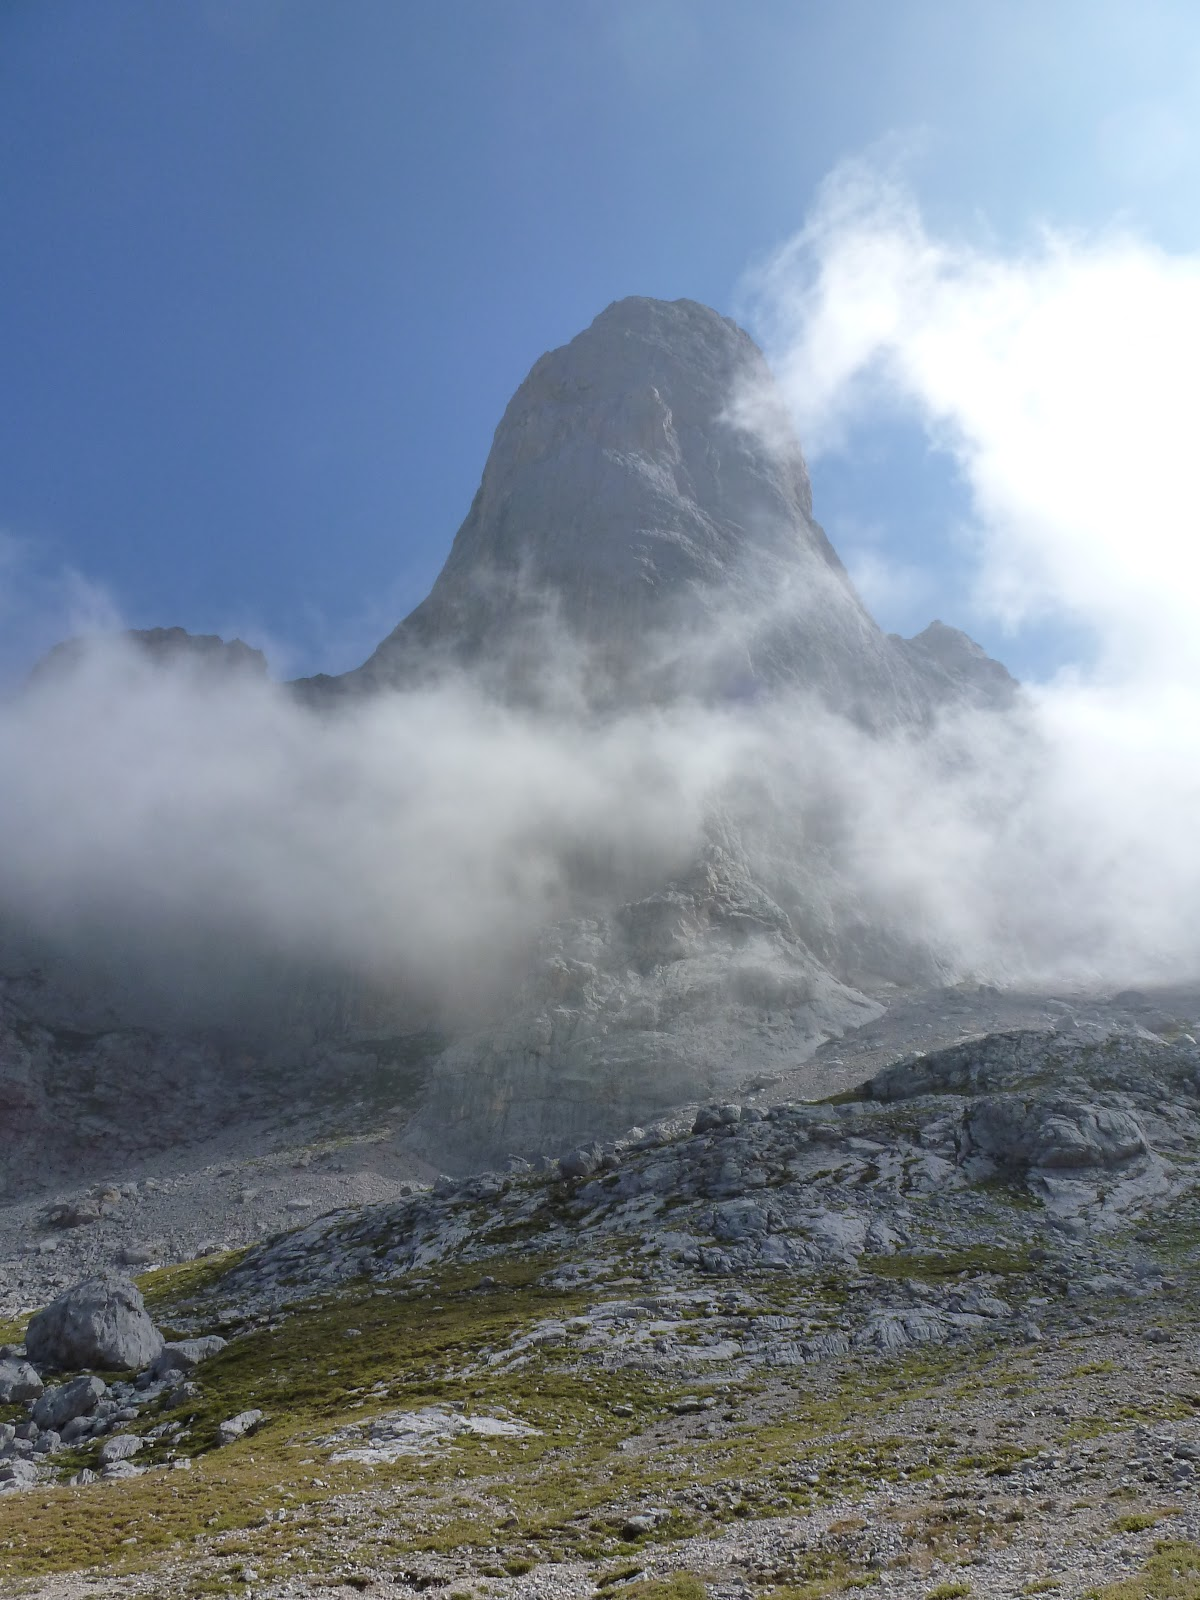 view of Naranjo de Bulnes rock face